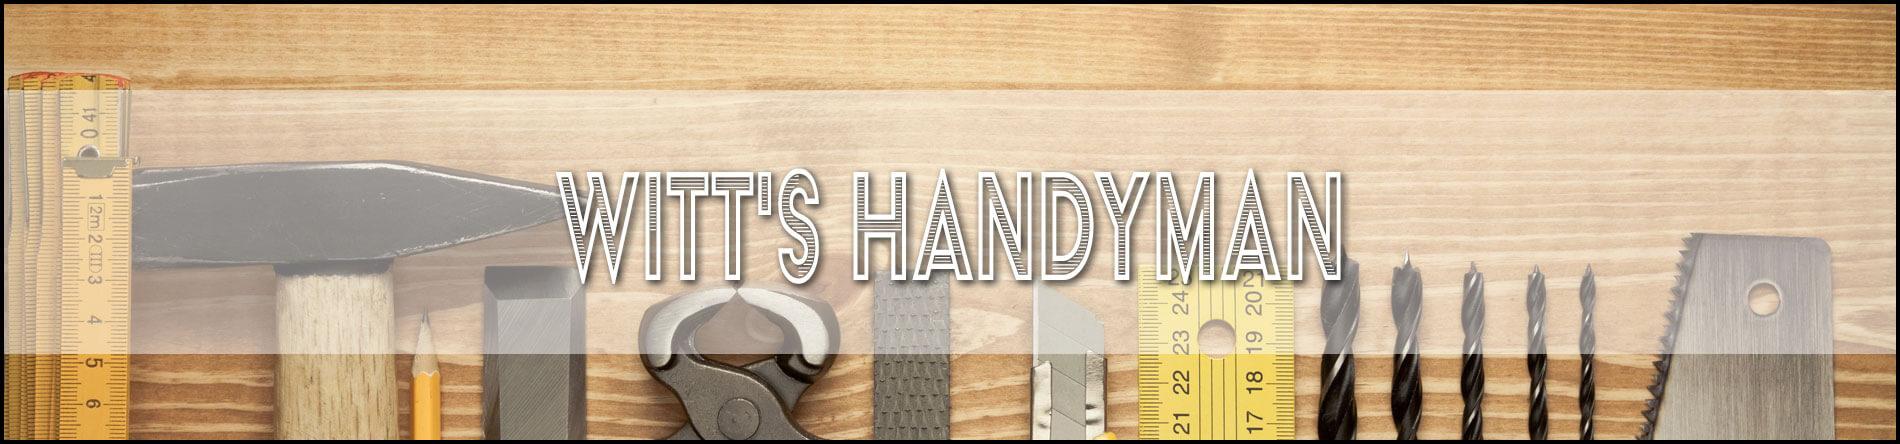 Witt's Handyman is a Professional Handyman in Hampton, IA